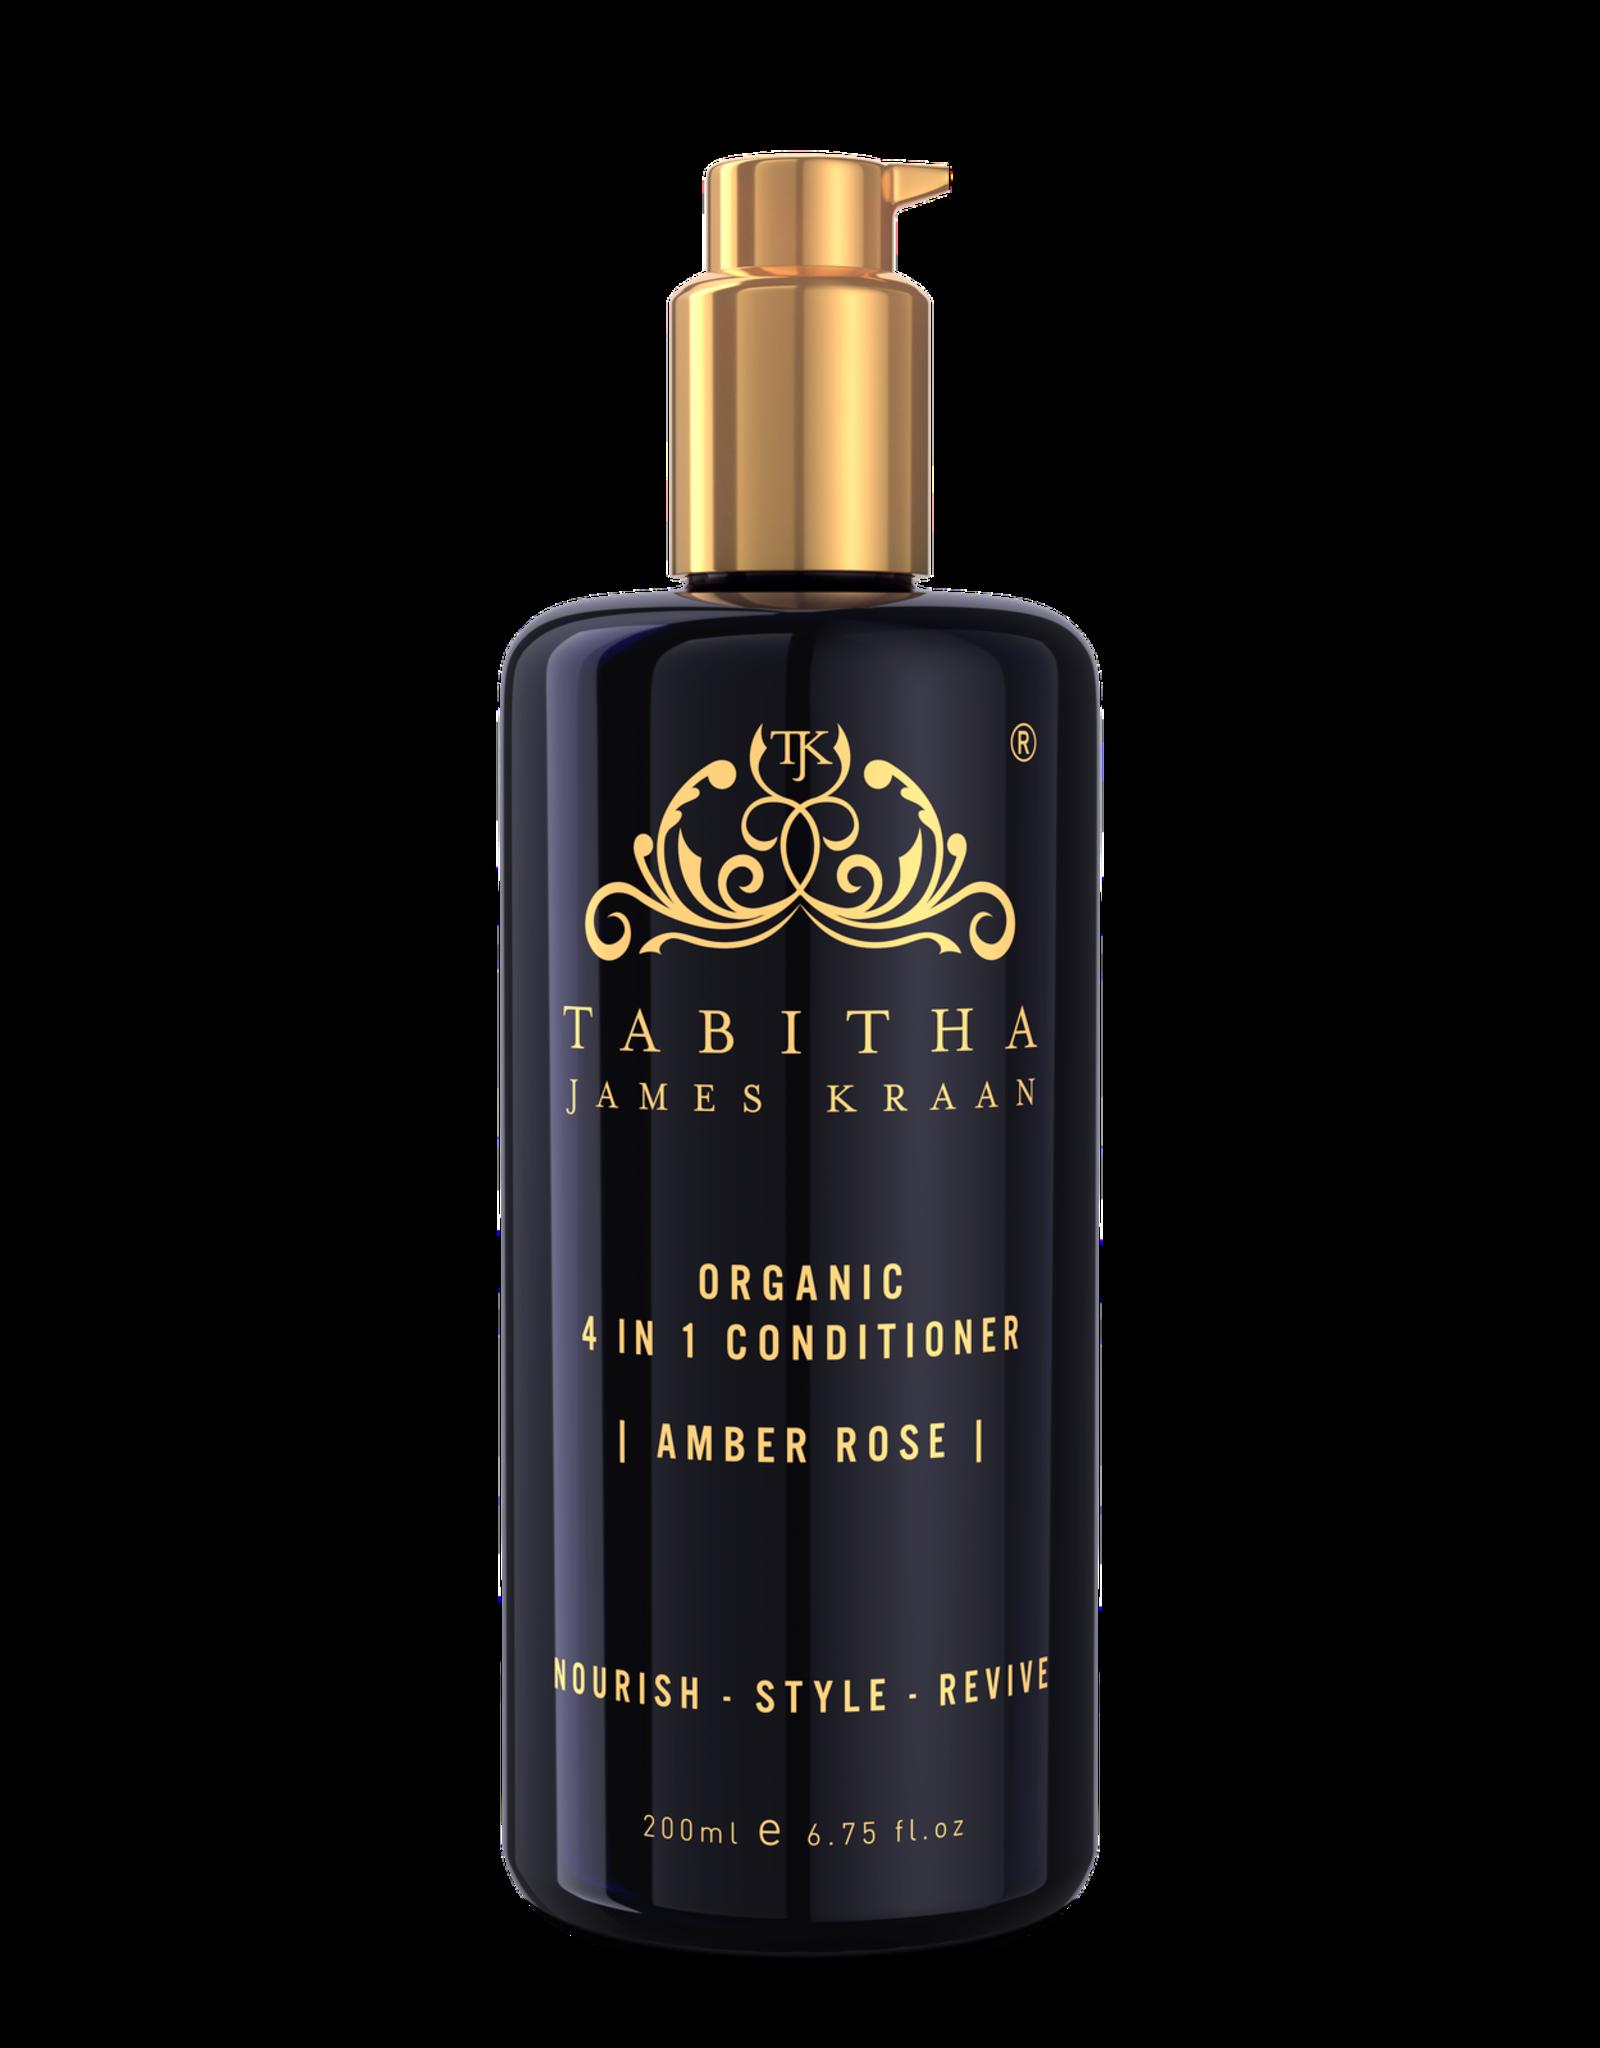 Tabitha James Kraan Luxury 4-in-1 conditioner Amber Rosé